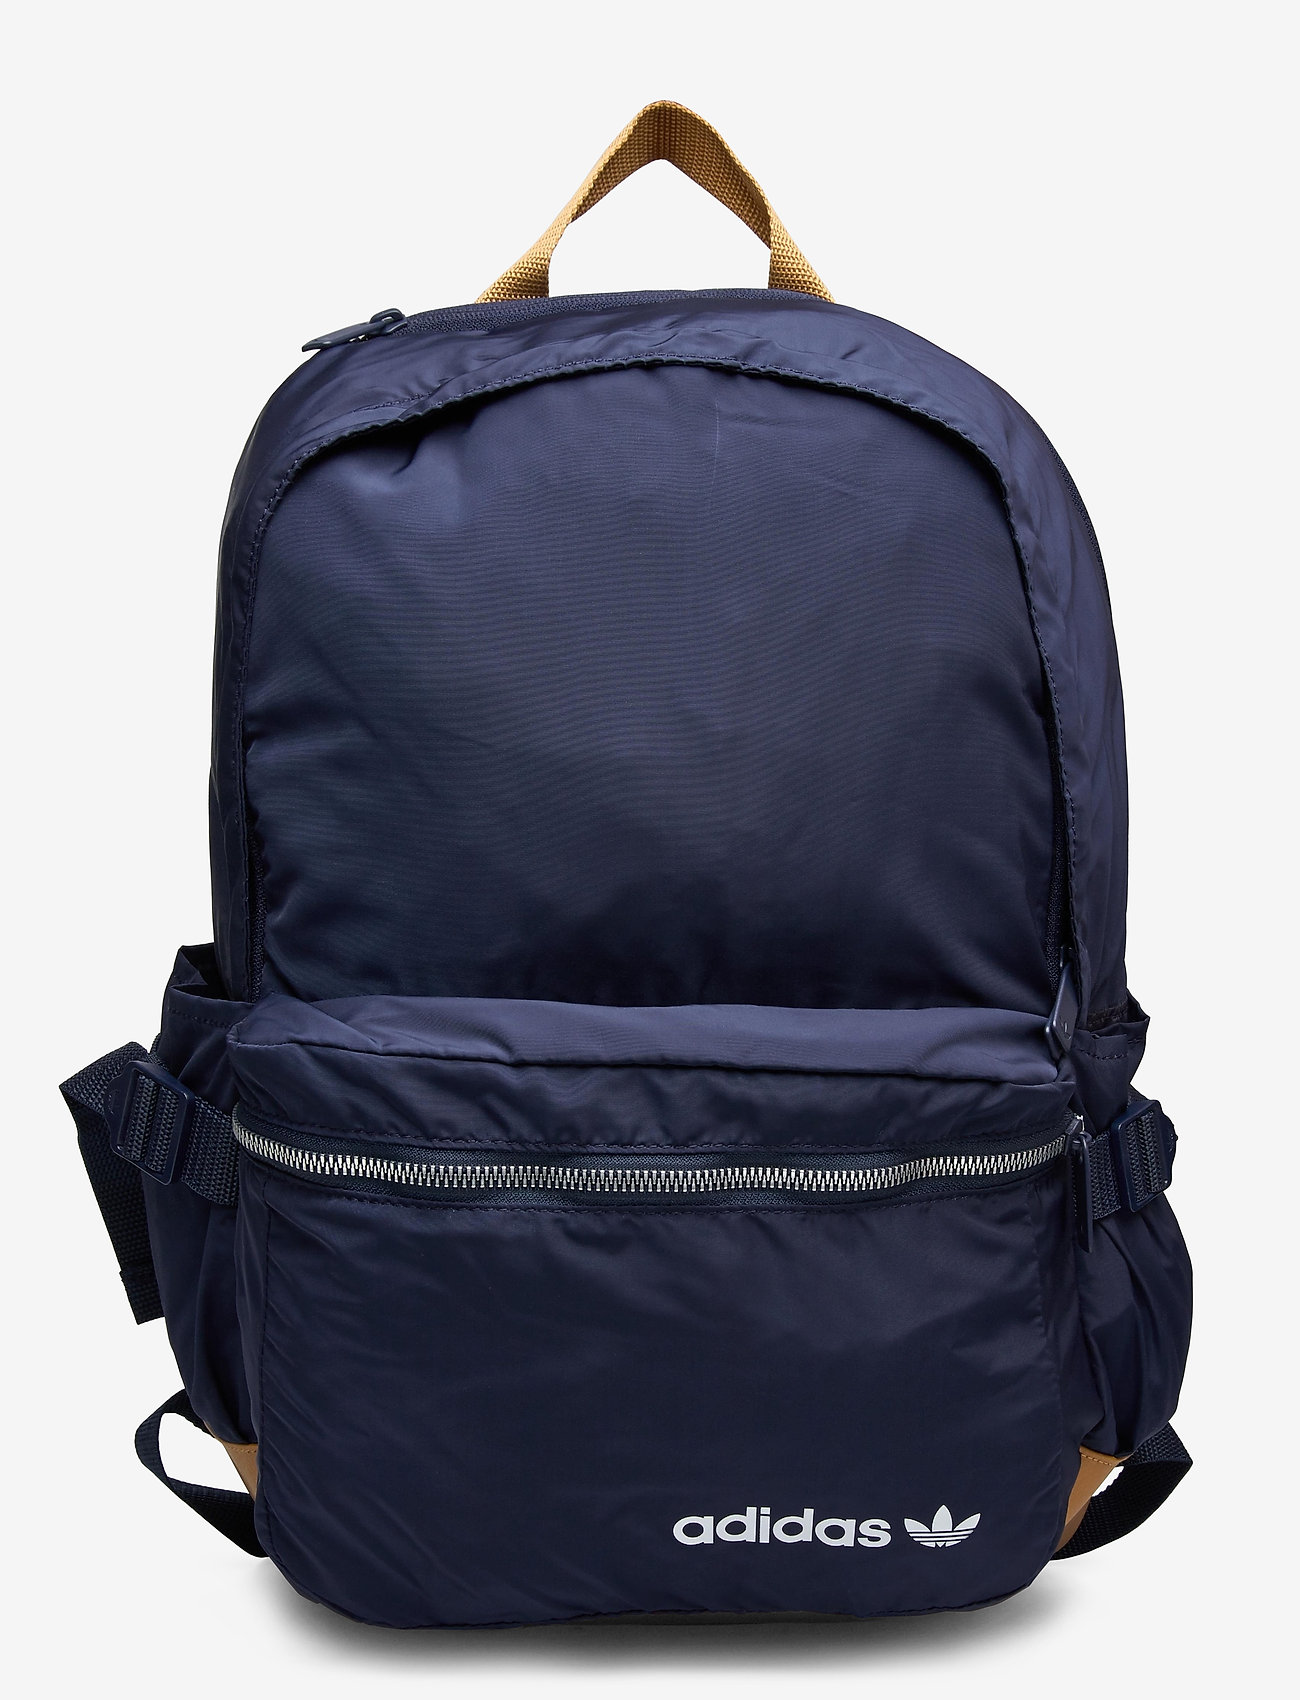 adidas Originals - PE MODERN BP - treenikassit - conavy/mesa - 0